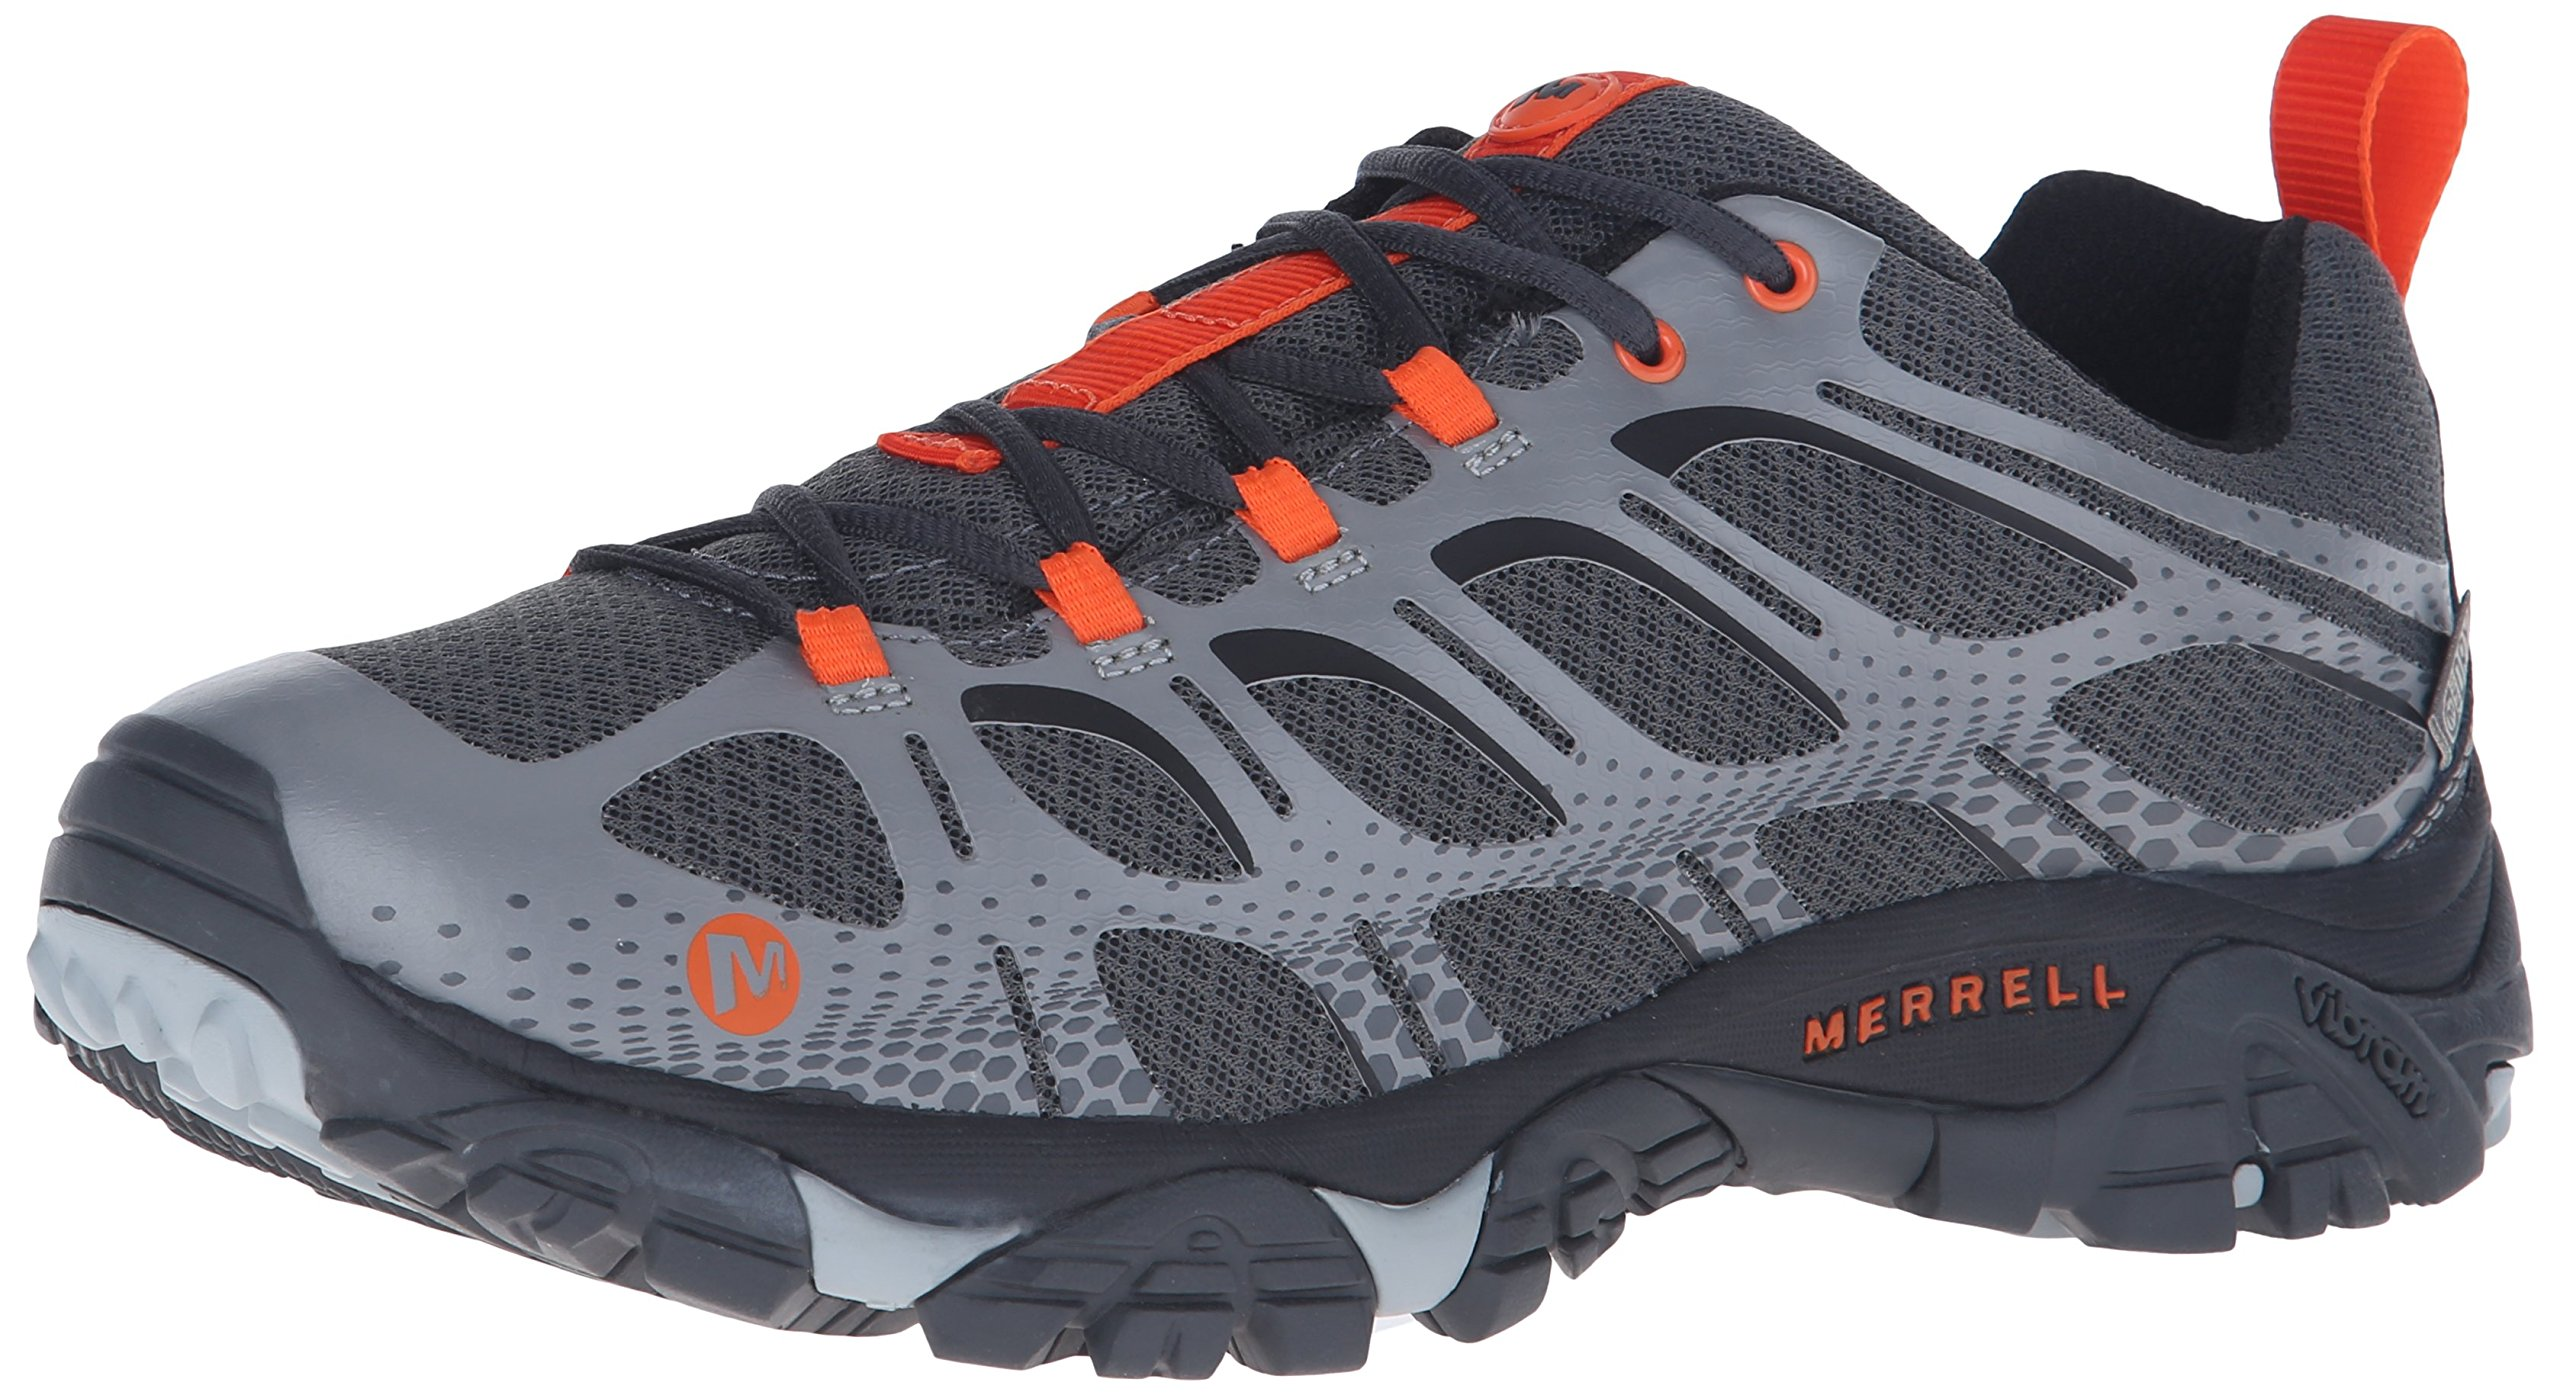 Merrell Men's Moab Edge Waterproof Hiking Shoe, Grey, 13 M US by Merrell